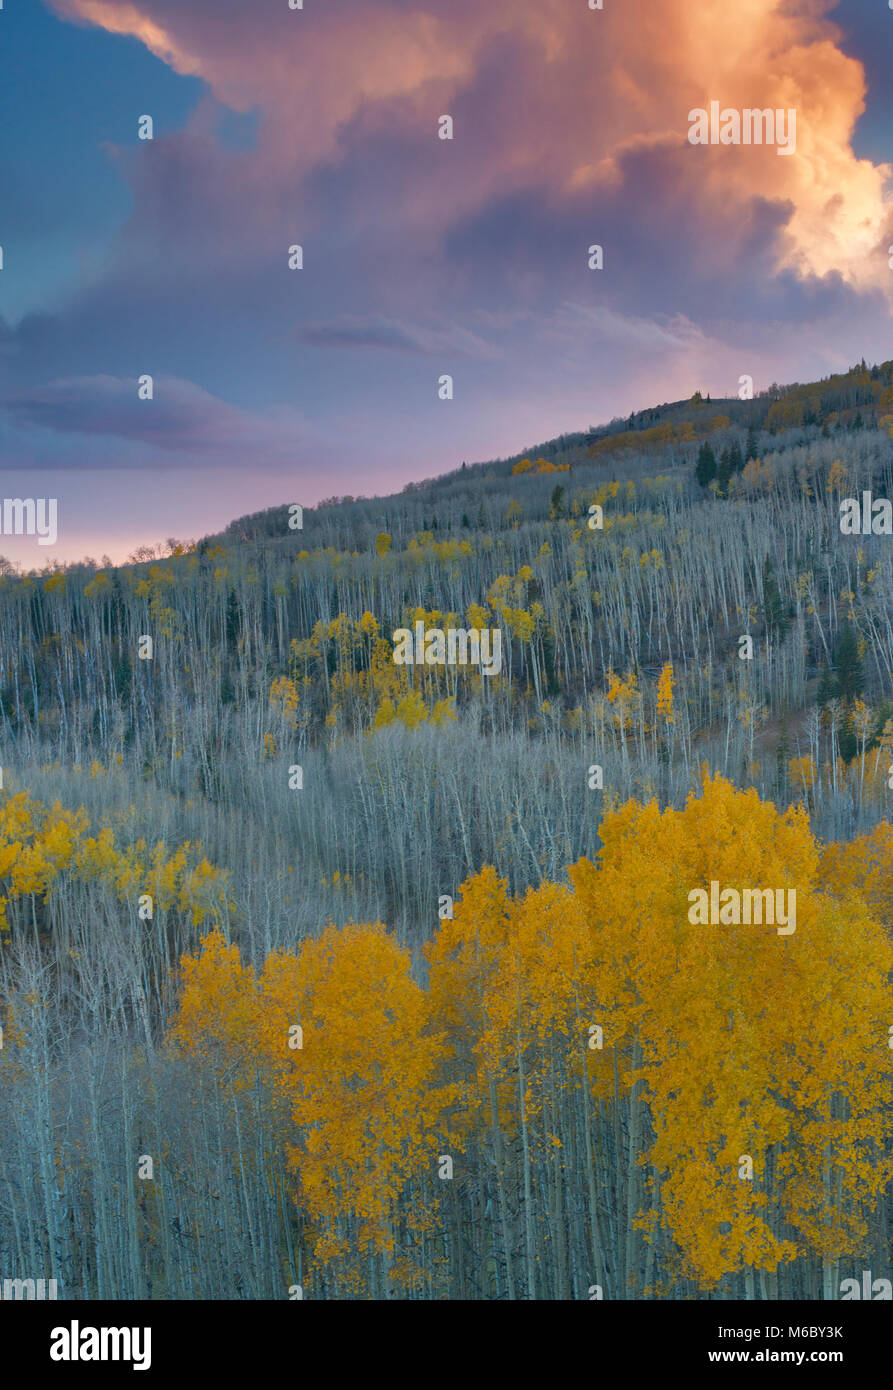 Sunset, Aspen, Populus Tremuloides, Boulder Mountain, Dixie National Forest, Utah - Stock Image